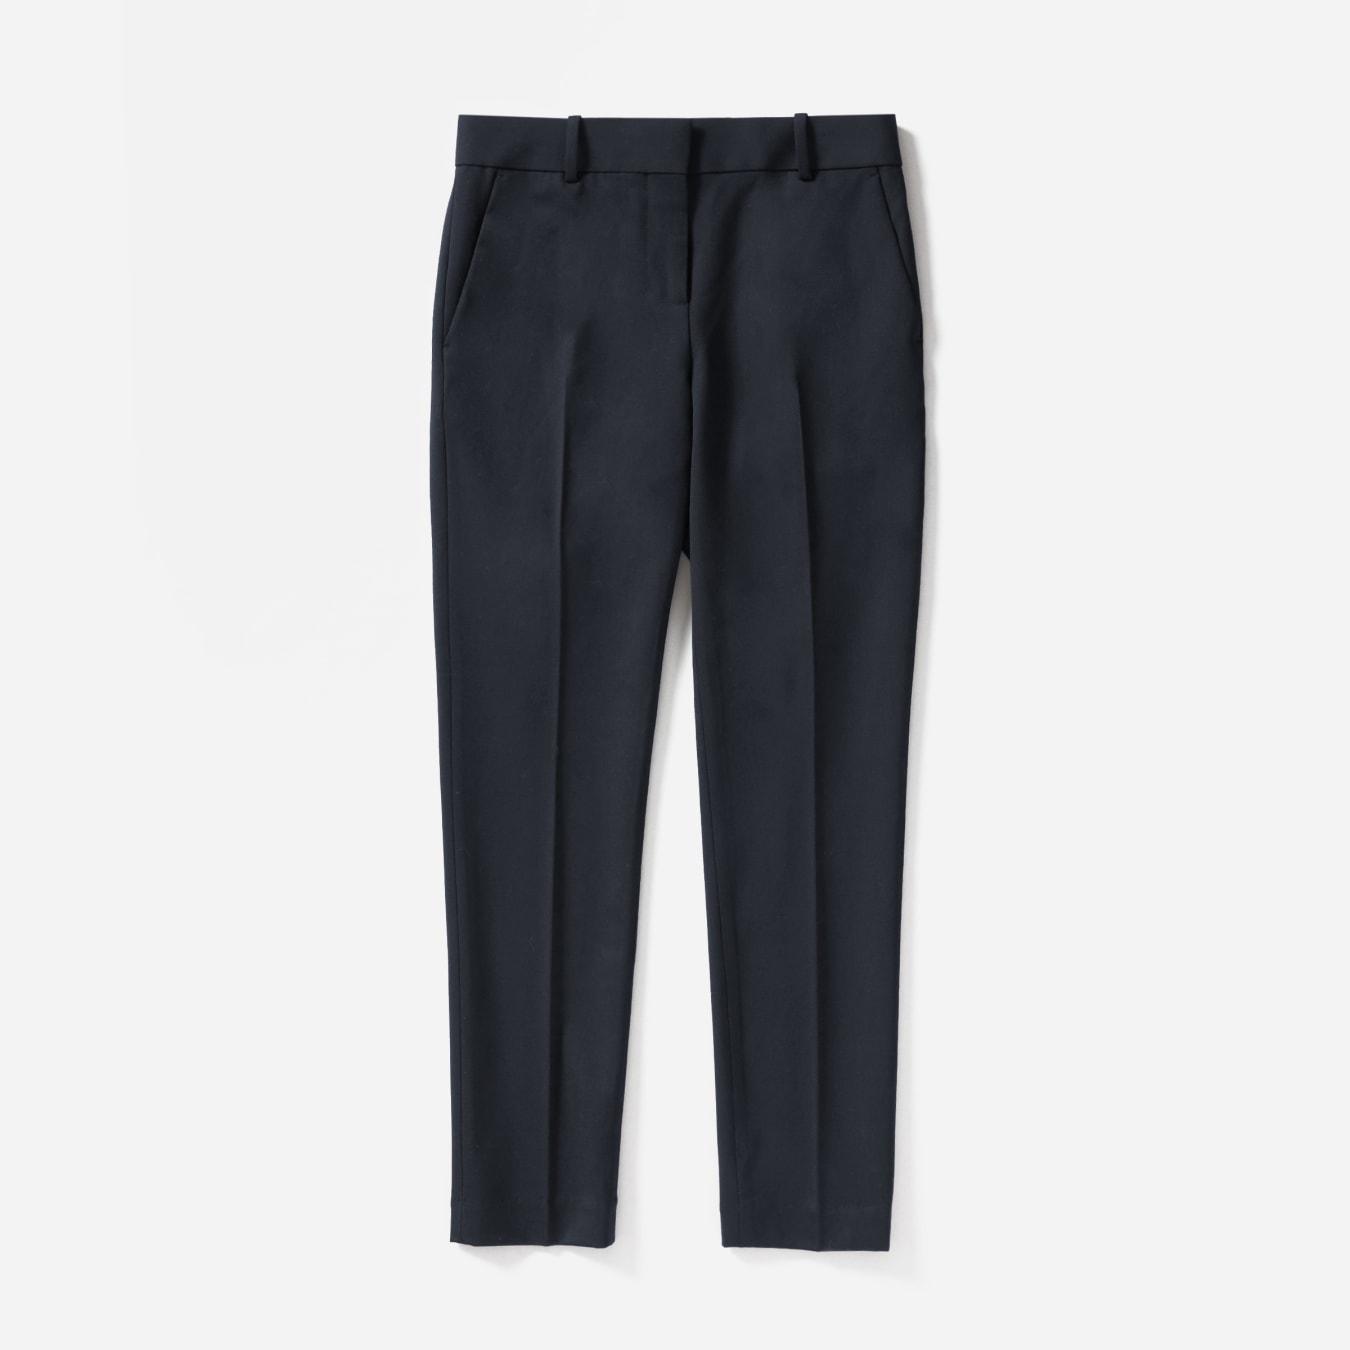 Ladies smart office work wool trousers Black Dark charcoal grey Size 12 16 NEW